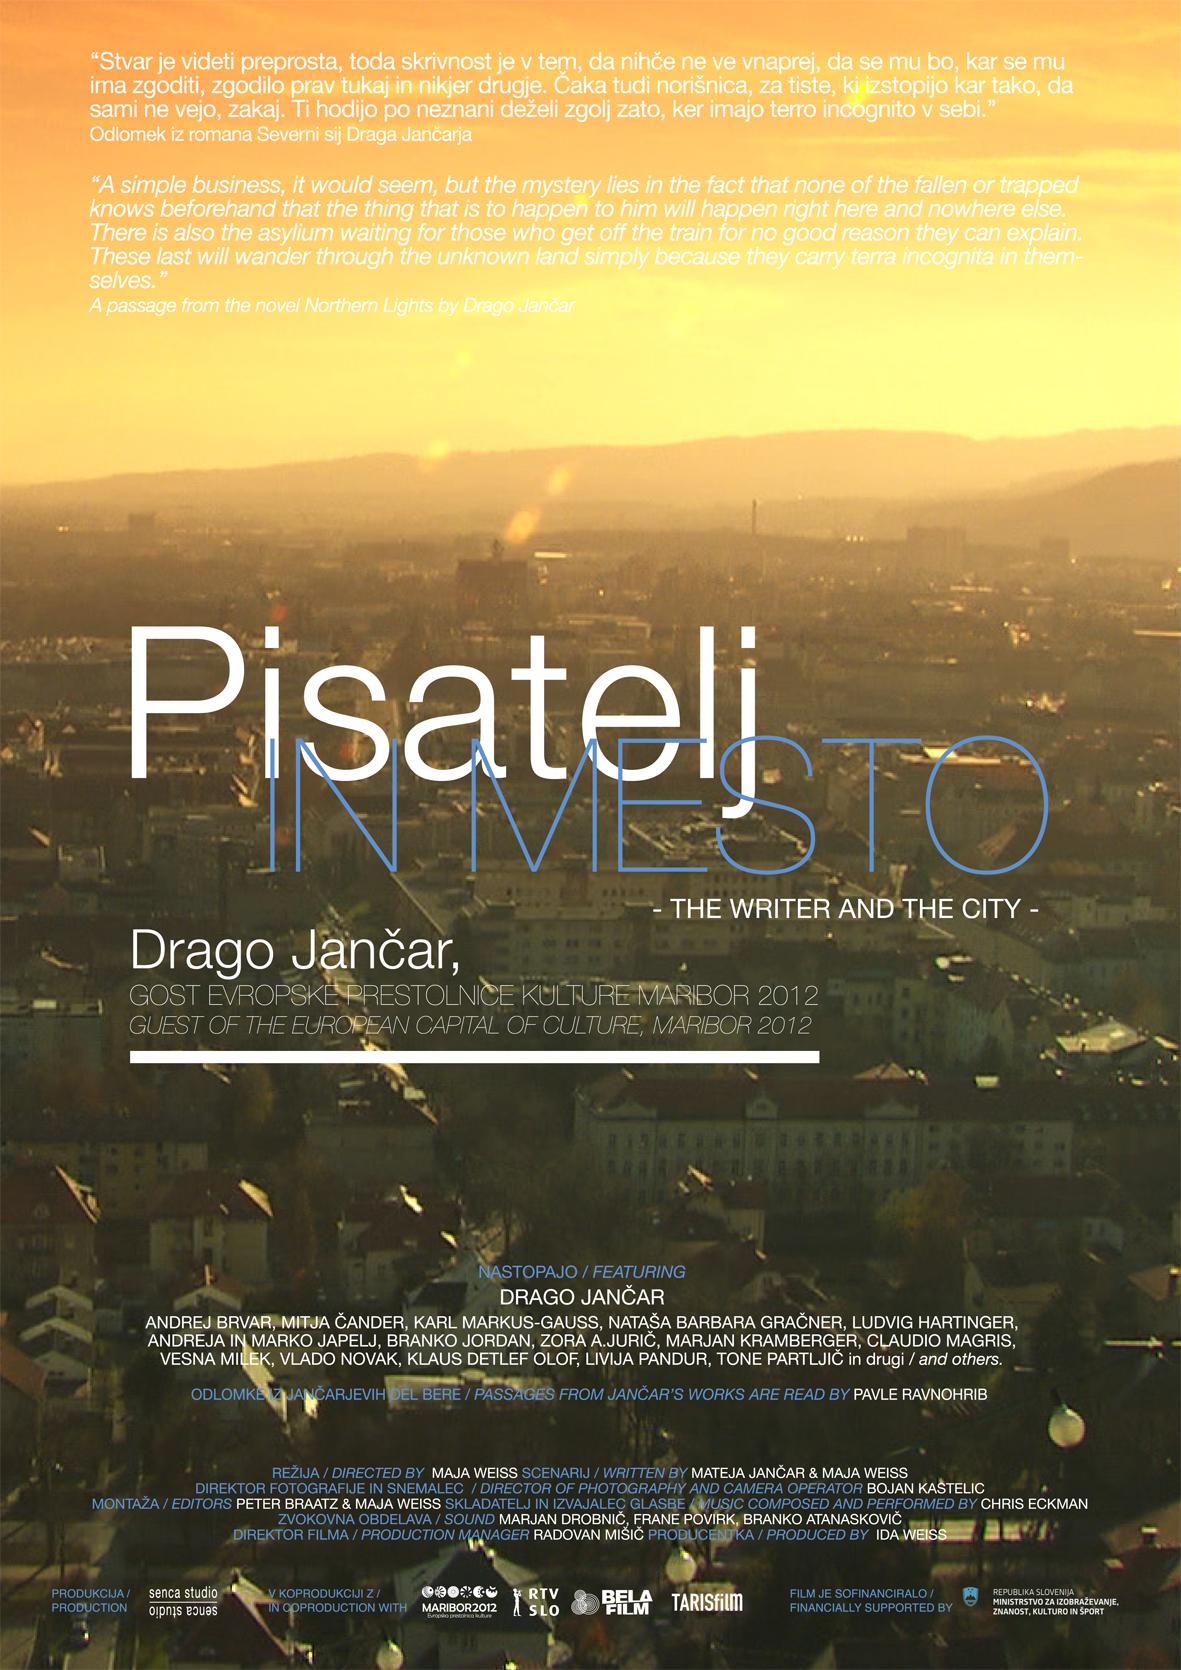 DRAGO JANCAR_Plakat_z napisom_zaNet